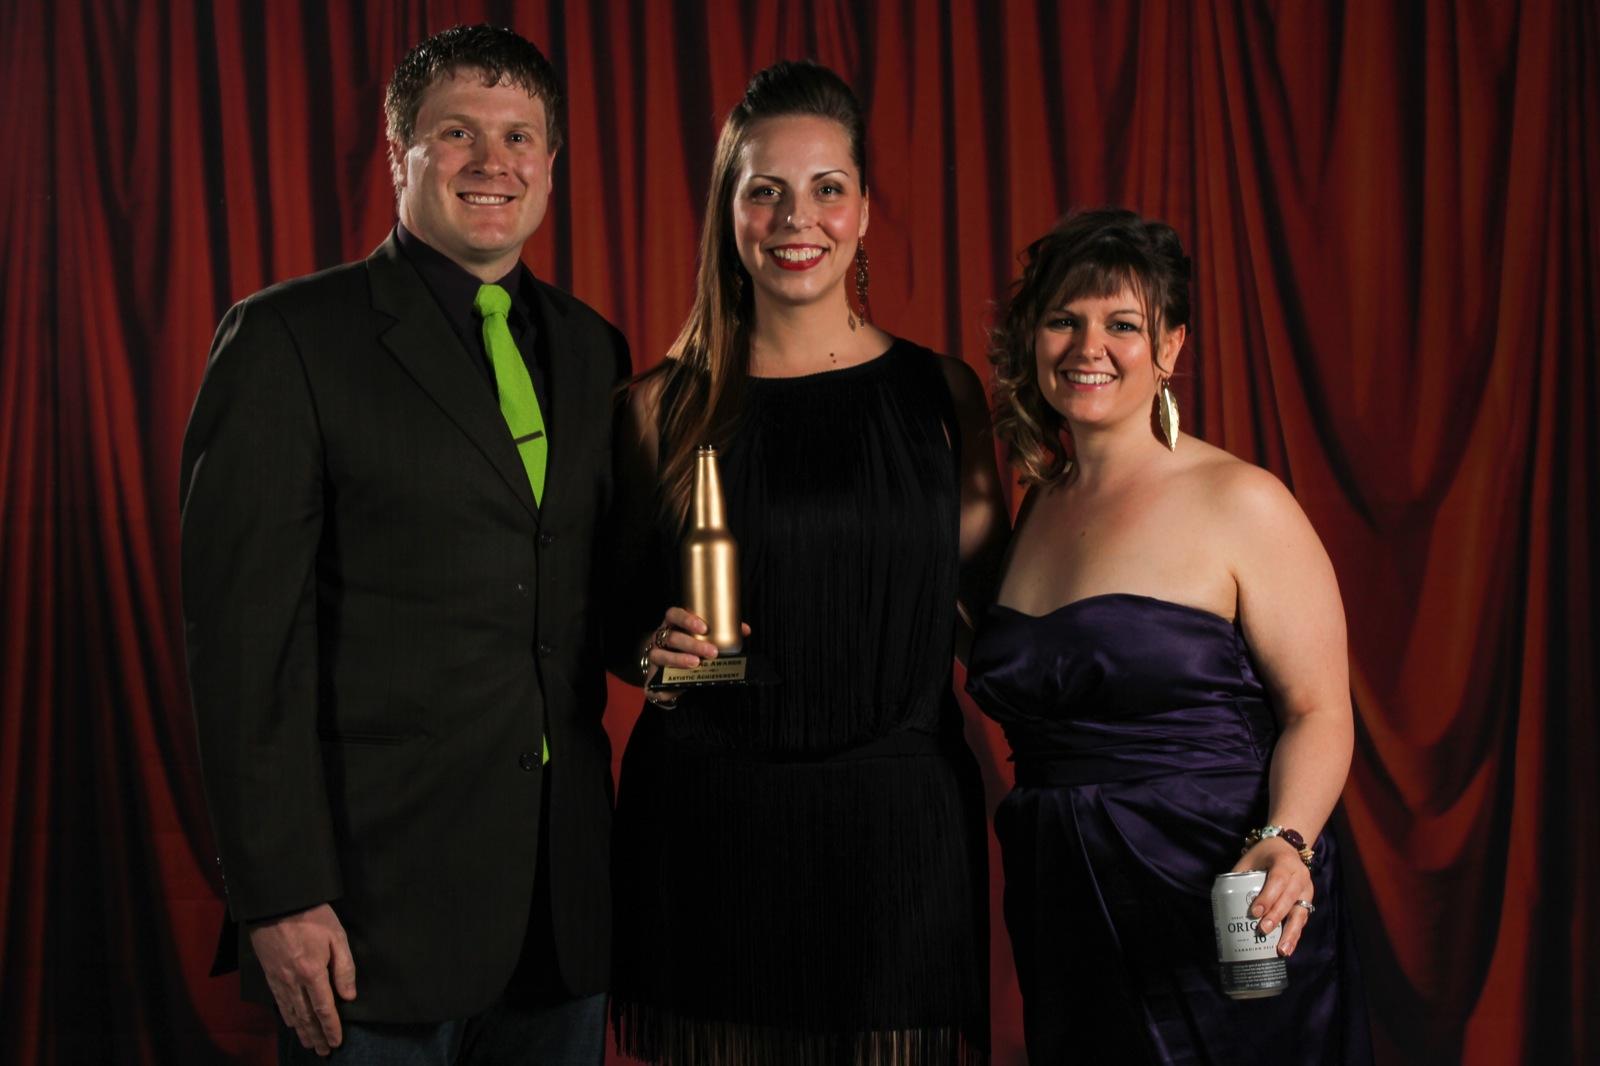 Ling Awards 2014 (9 of 224).jpg